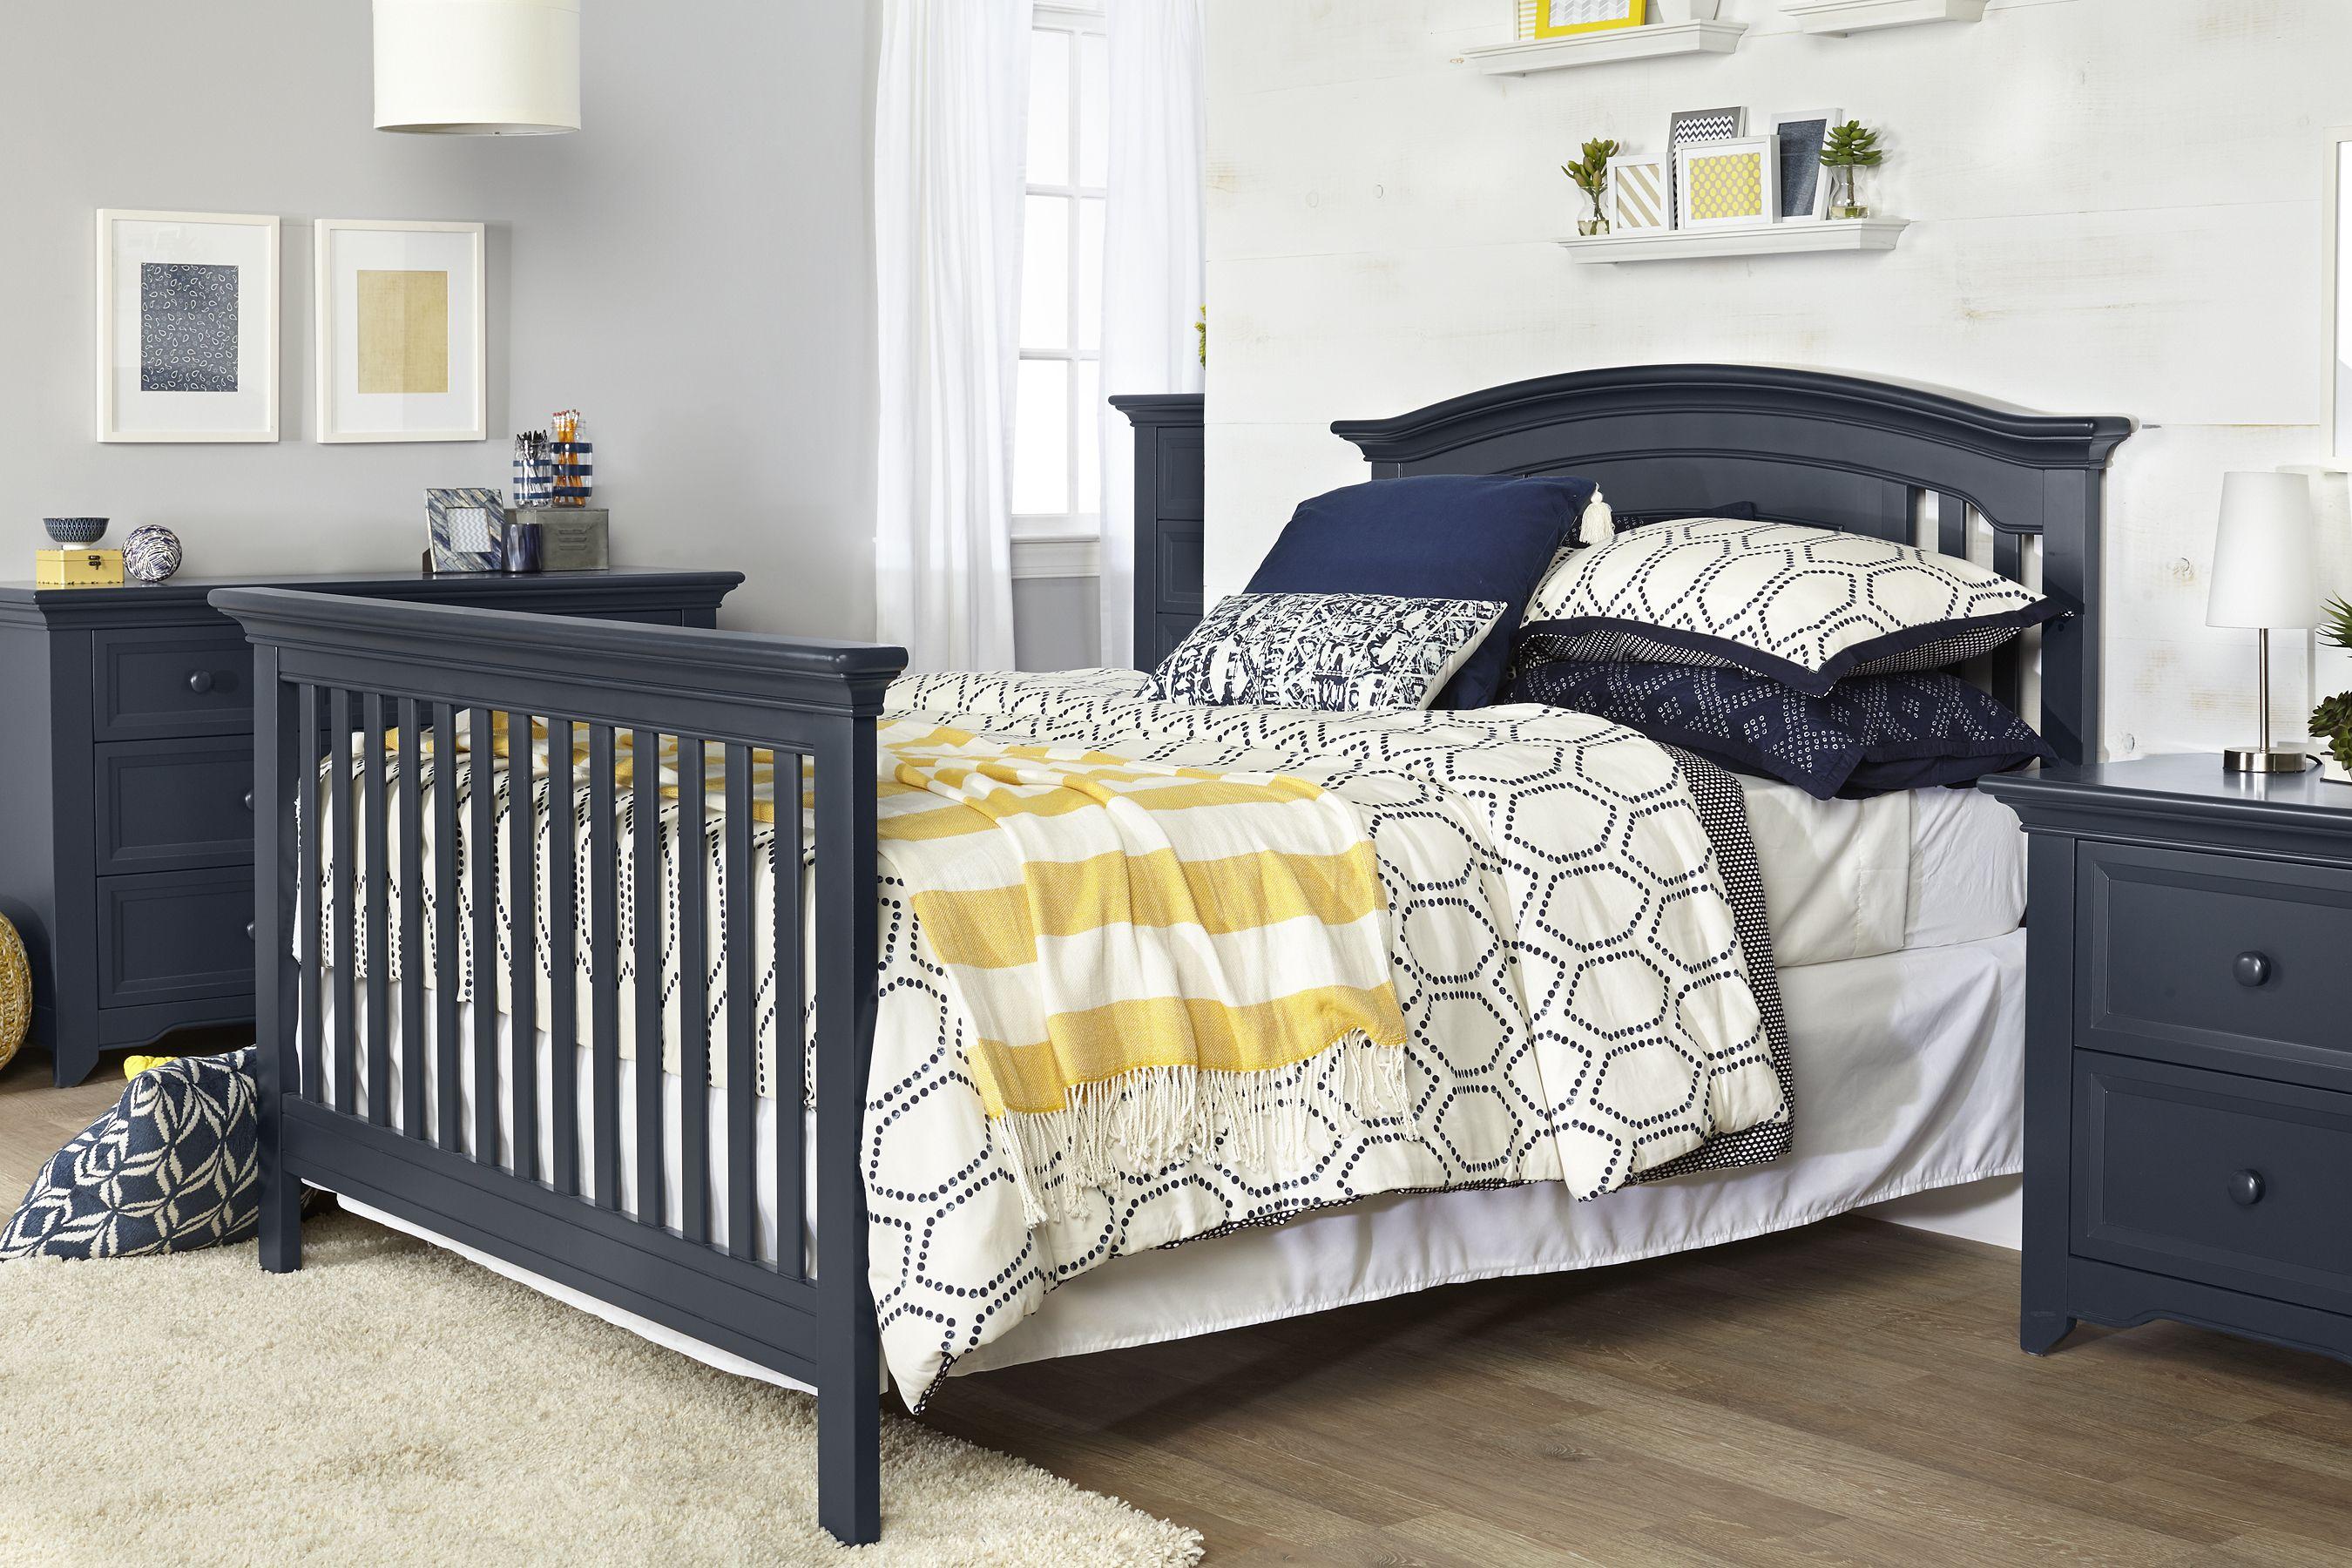 Baby Cache Harbor Full Bed In Navy Mist Babycache Crib Bed